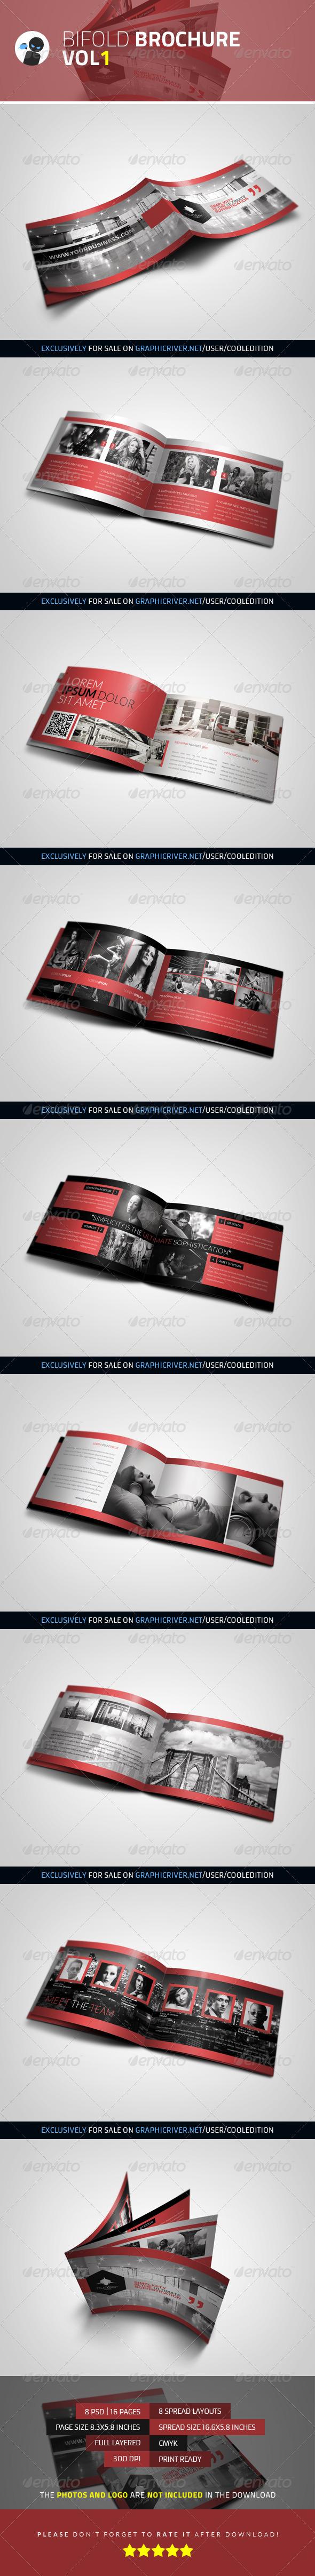 Bifold Brochure - VOL1 - Brochures Print Templates